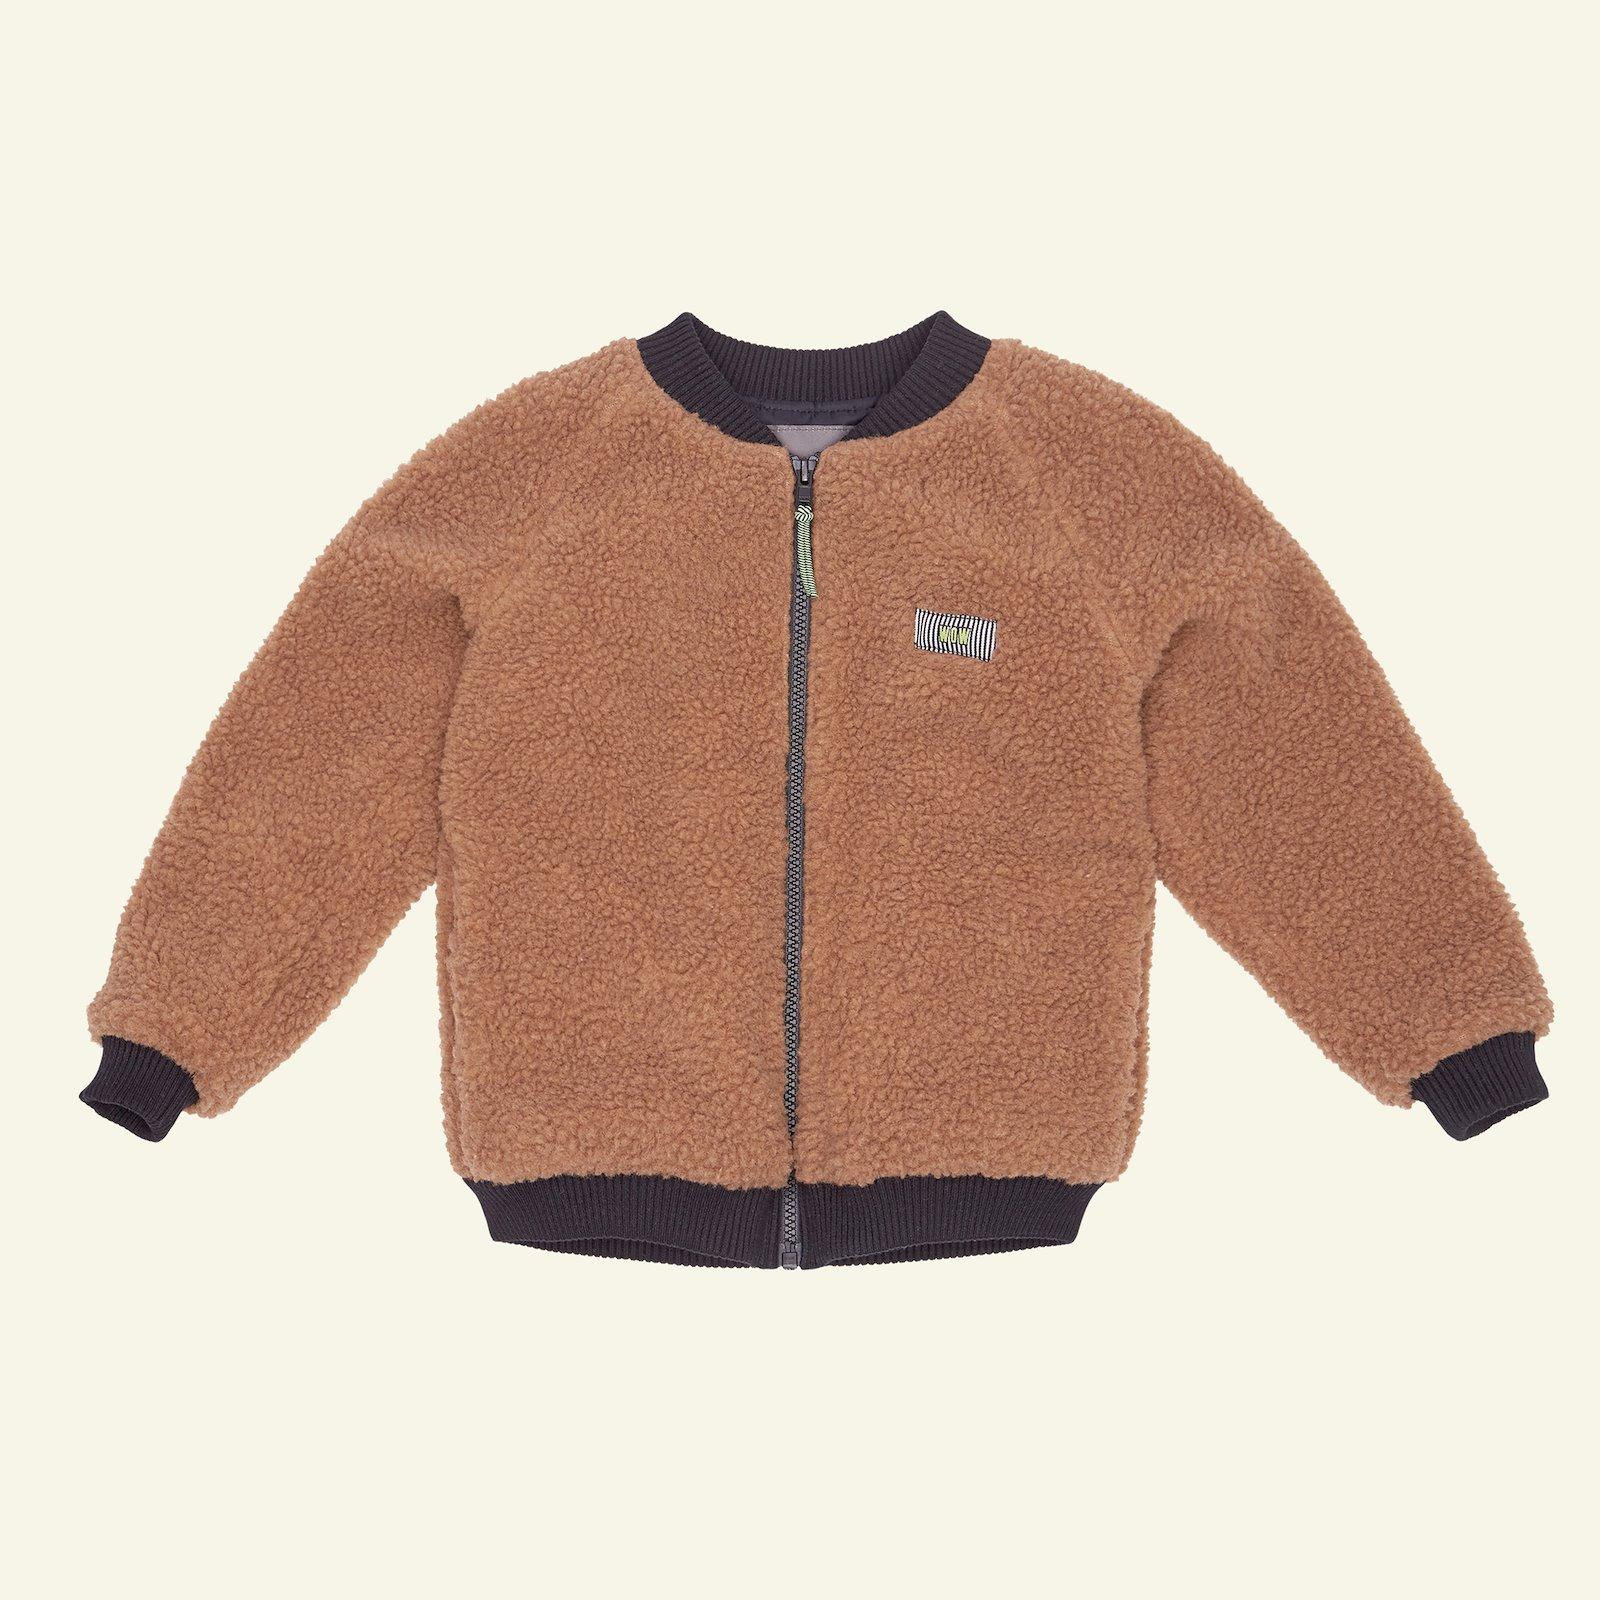 Bomber jacket, 134/9y p64017_910274_96077_26437_sskit